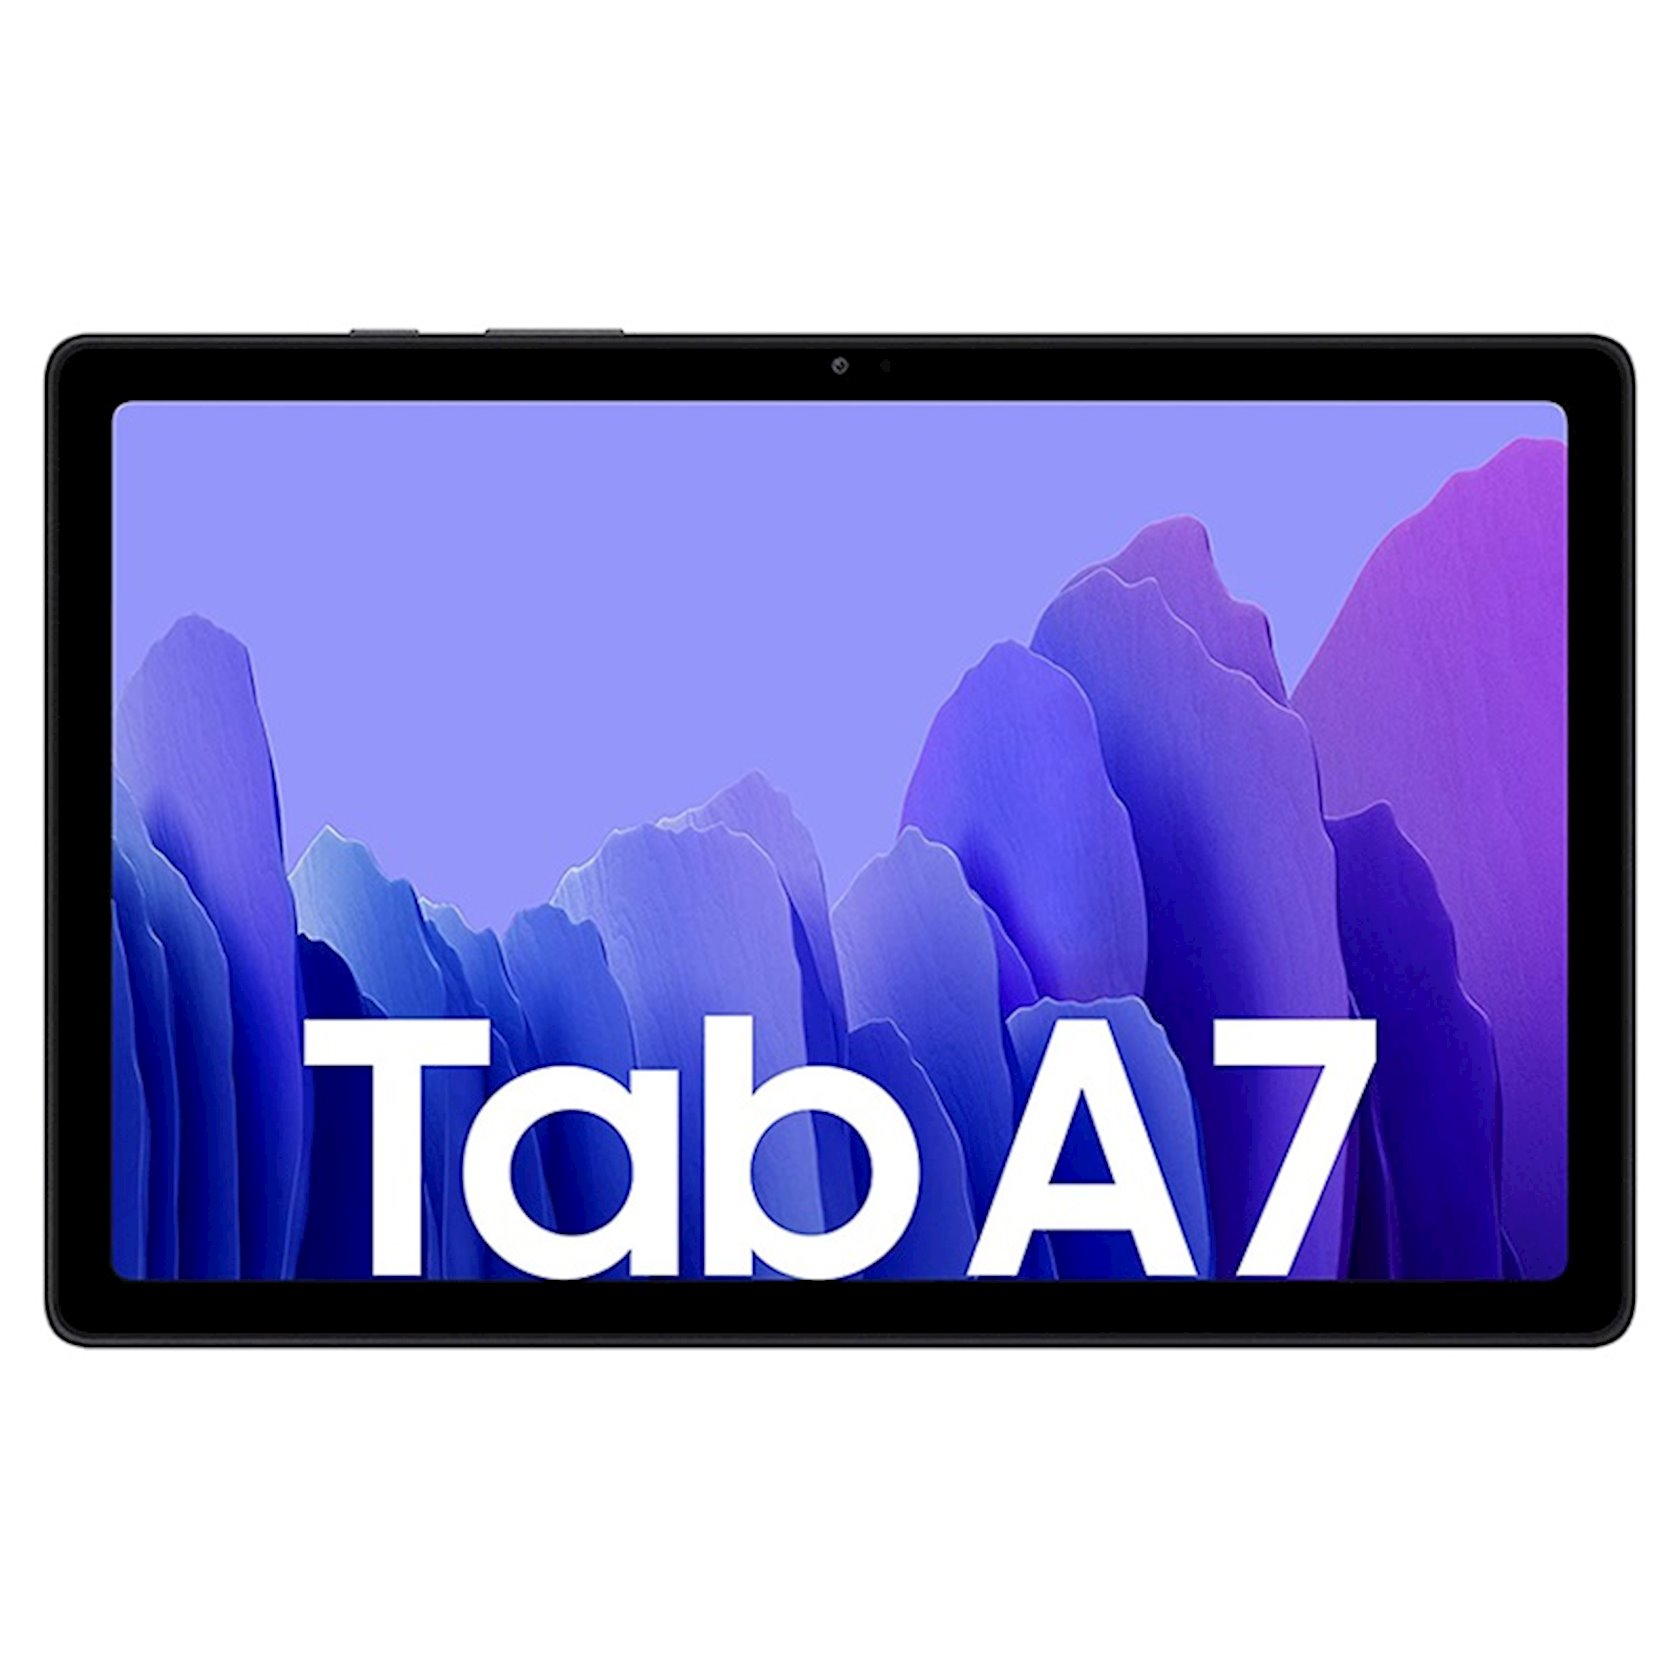 Planşet Samsung Galaxy Tab A7 10.4 SM-T505 32GB 2020 Silver